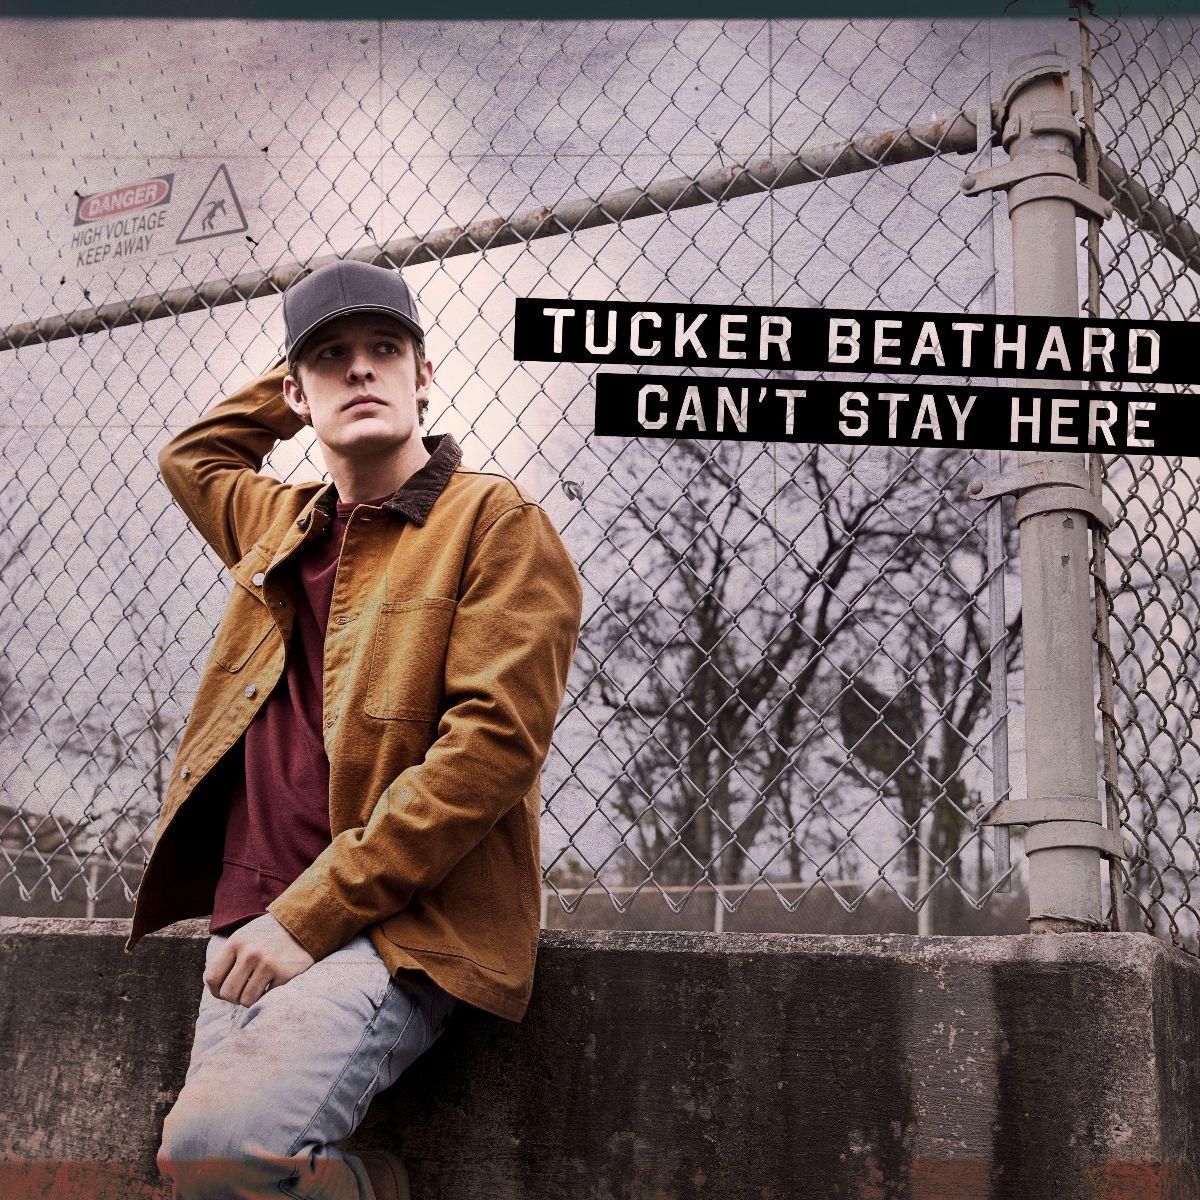 tucker-beathard-cant